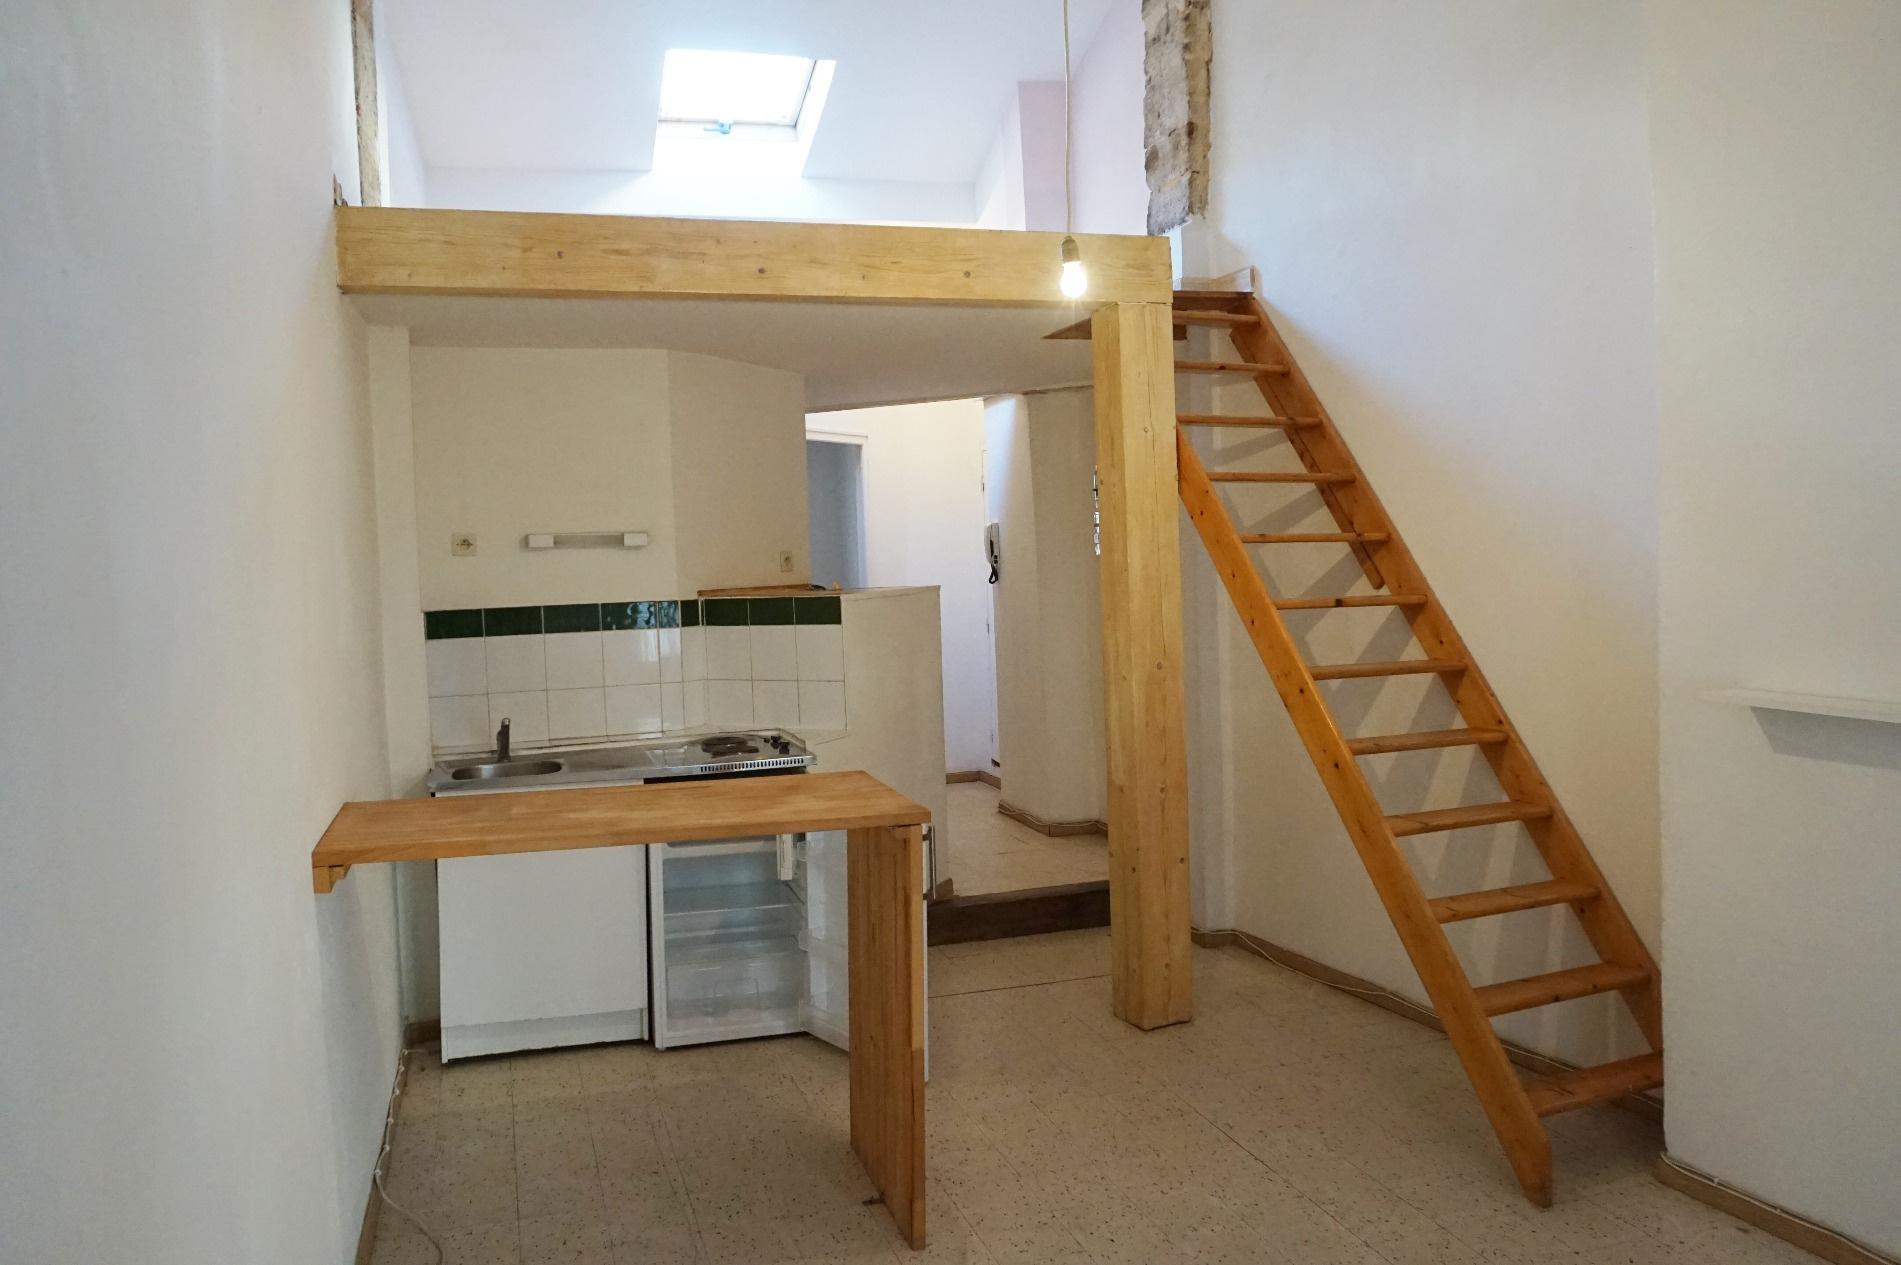 location appartement f2 mezzanine. Black Bedroom Furniture Sets. Home Design Ideas